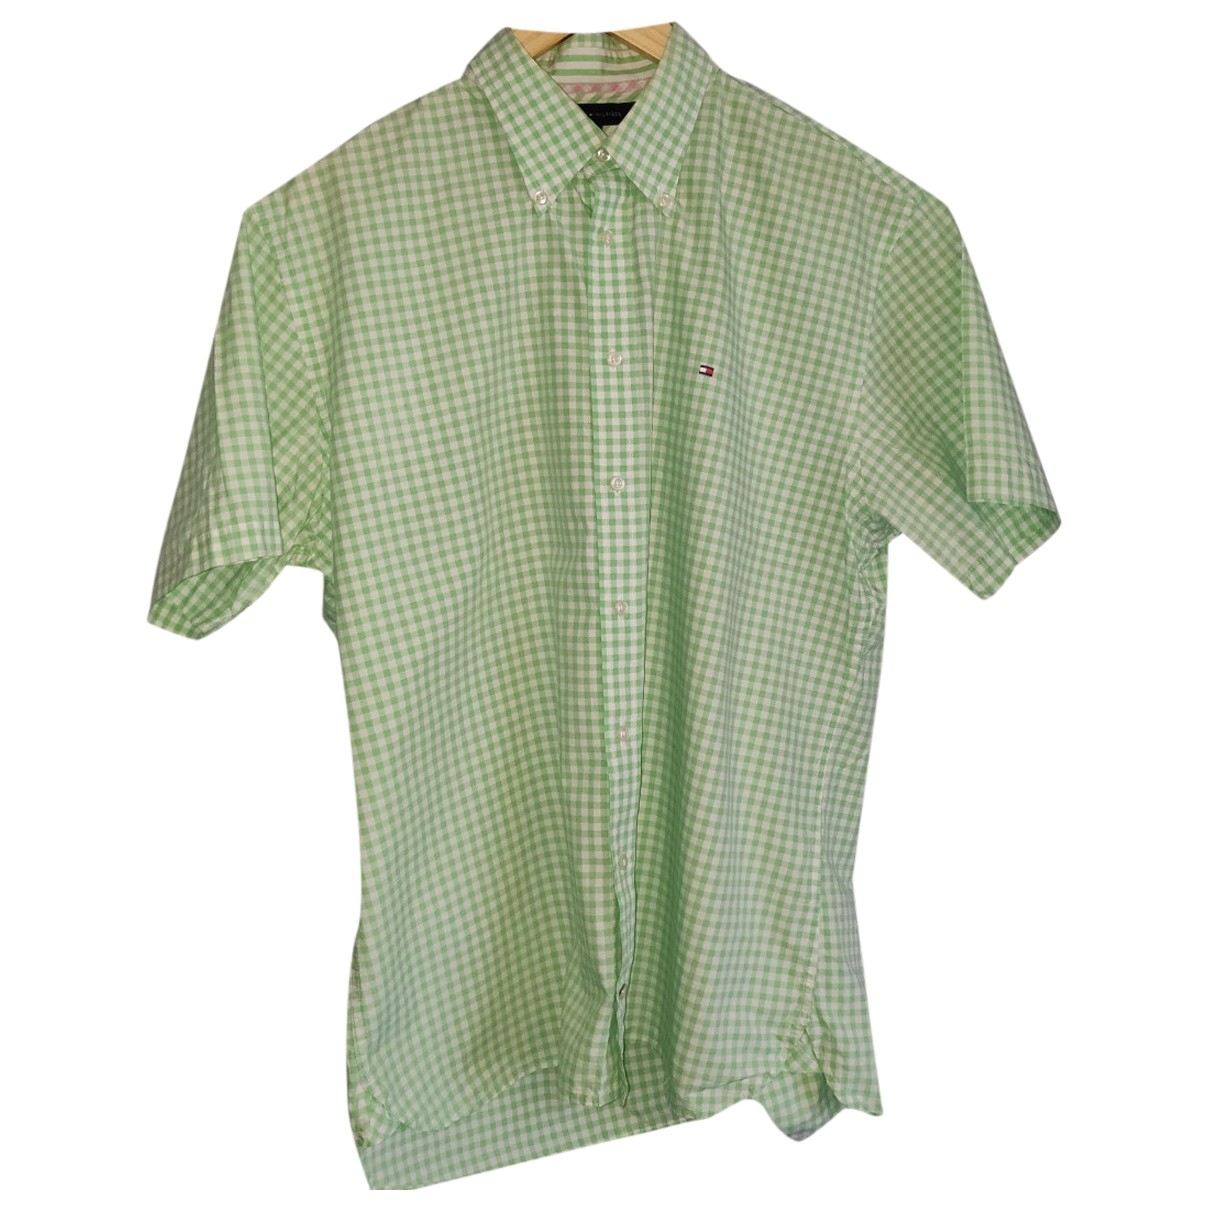 Tommy Hilfiger \N Green Cotton Shirts for Men XL International